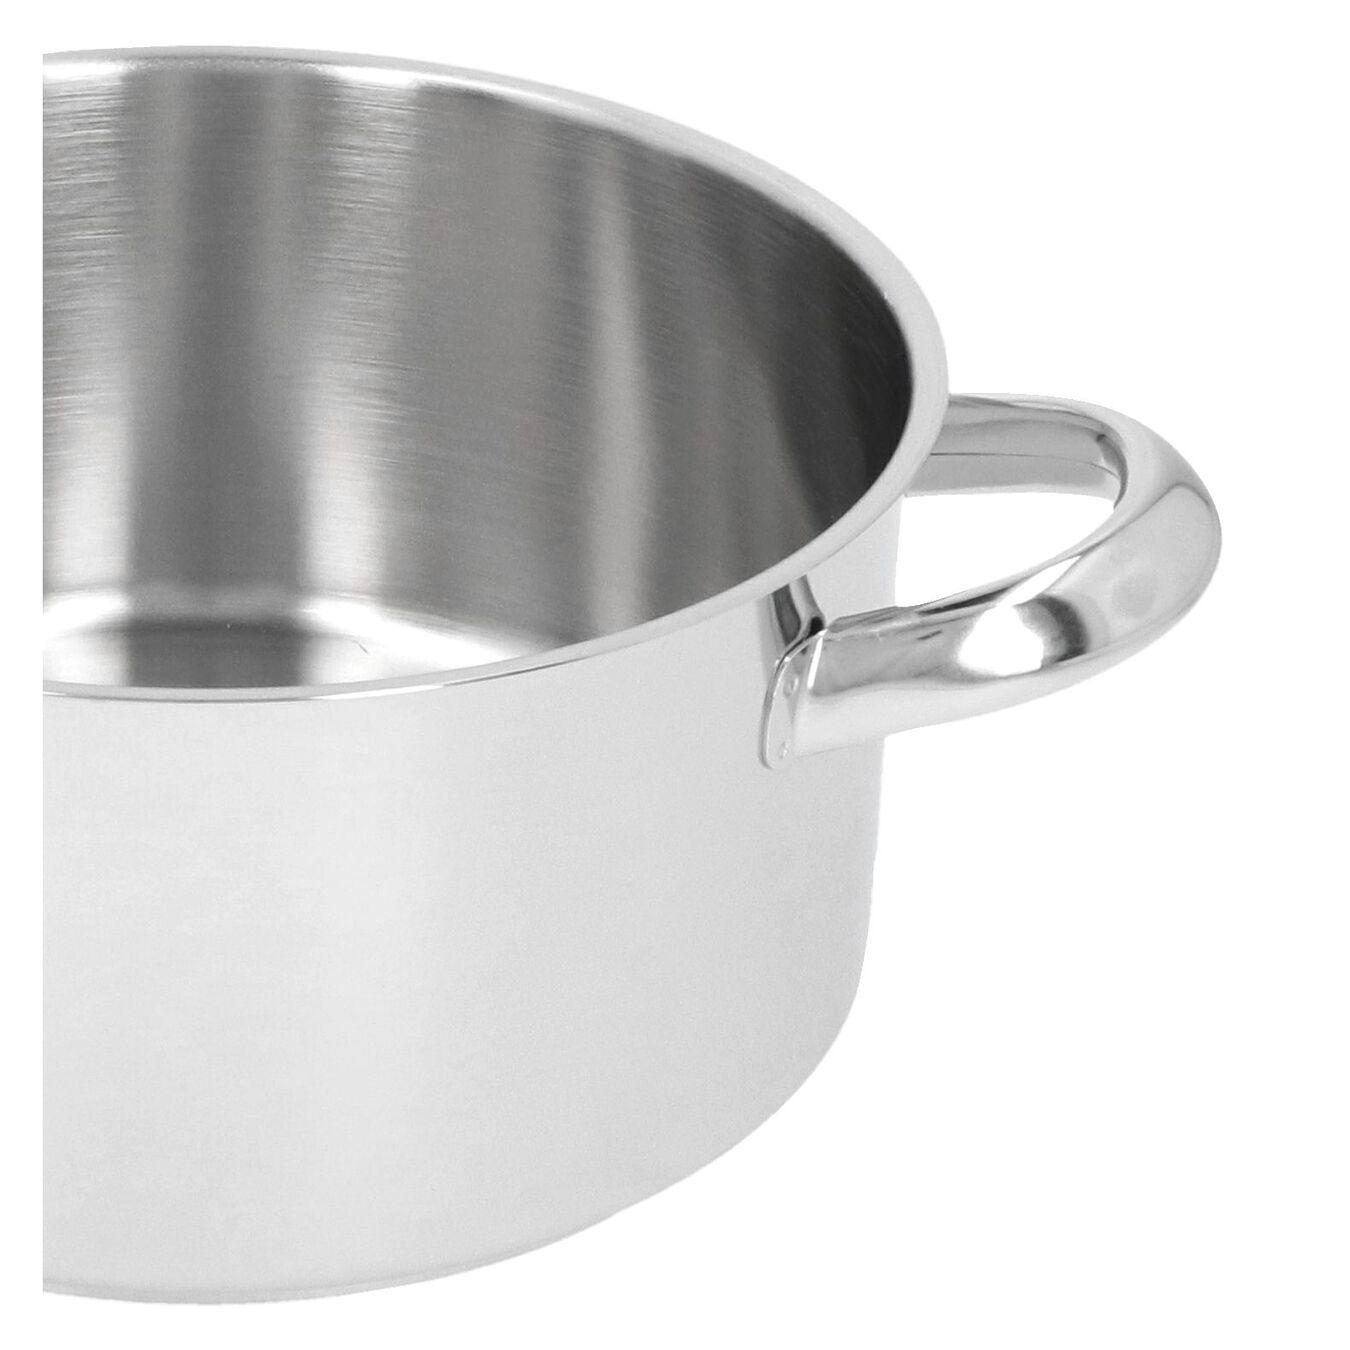 Kookpot met deksel 18 cm / 2,2 l,,large 4